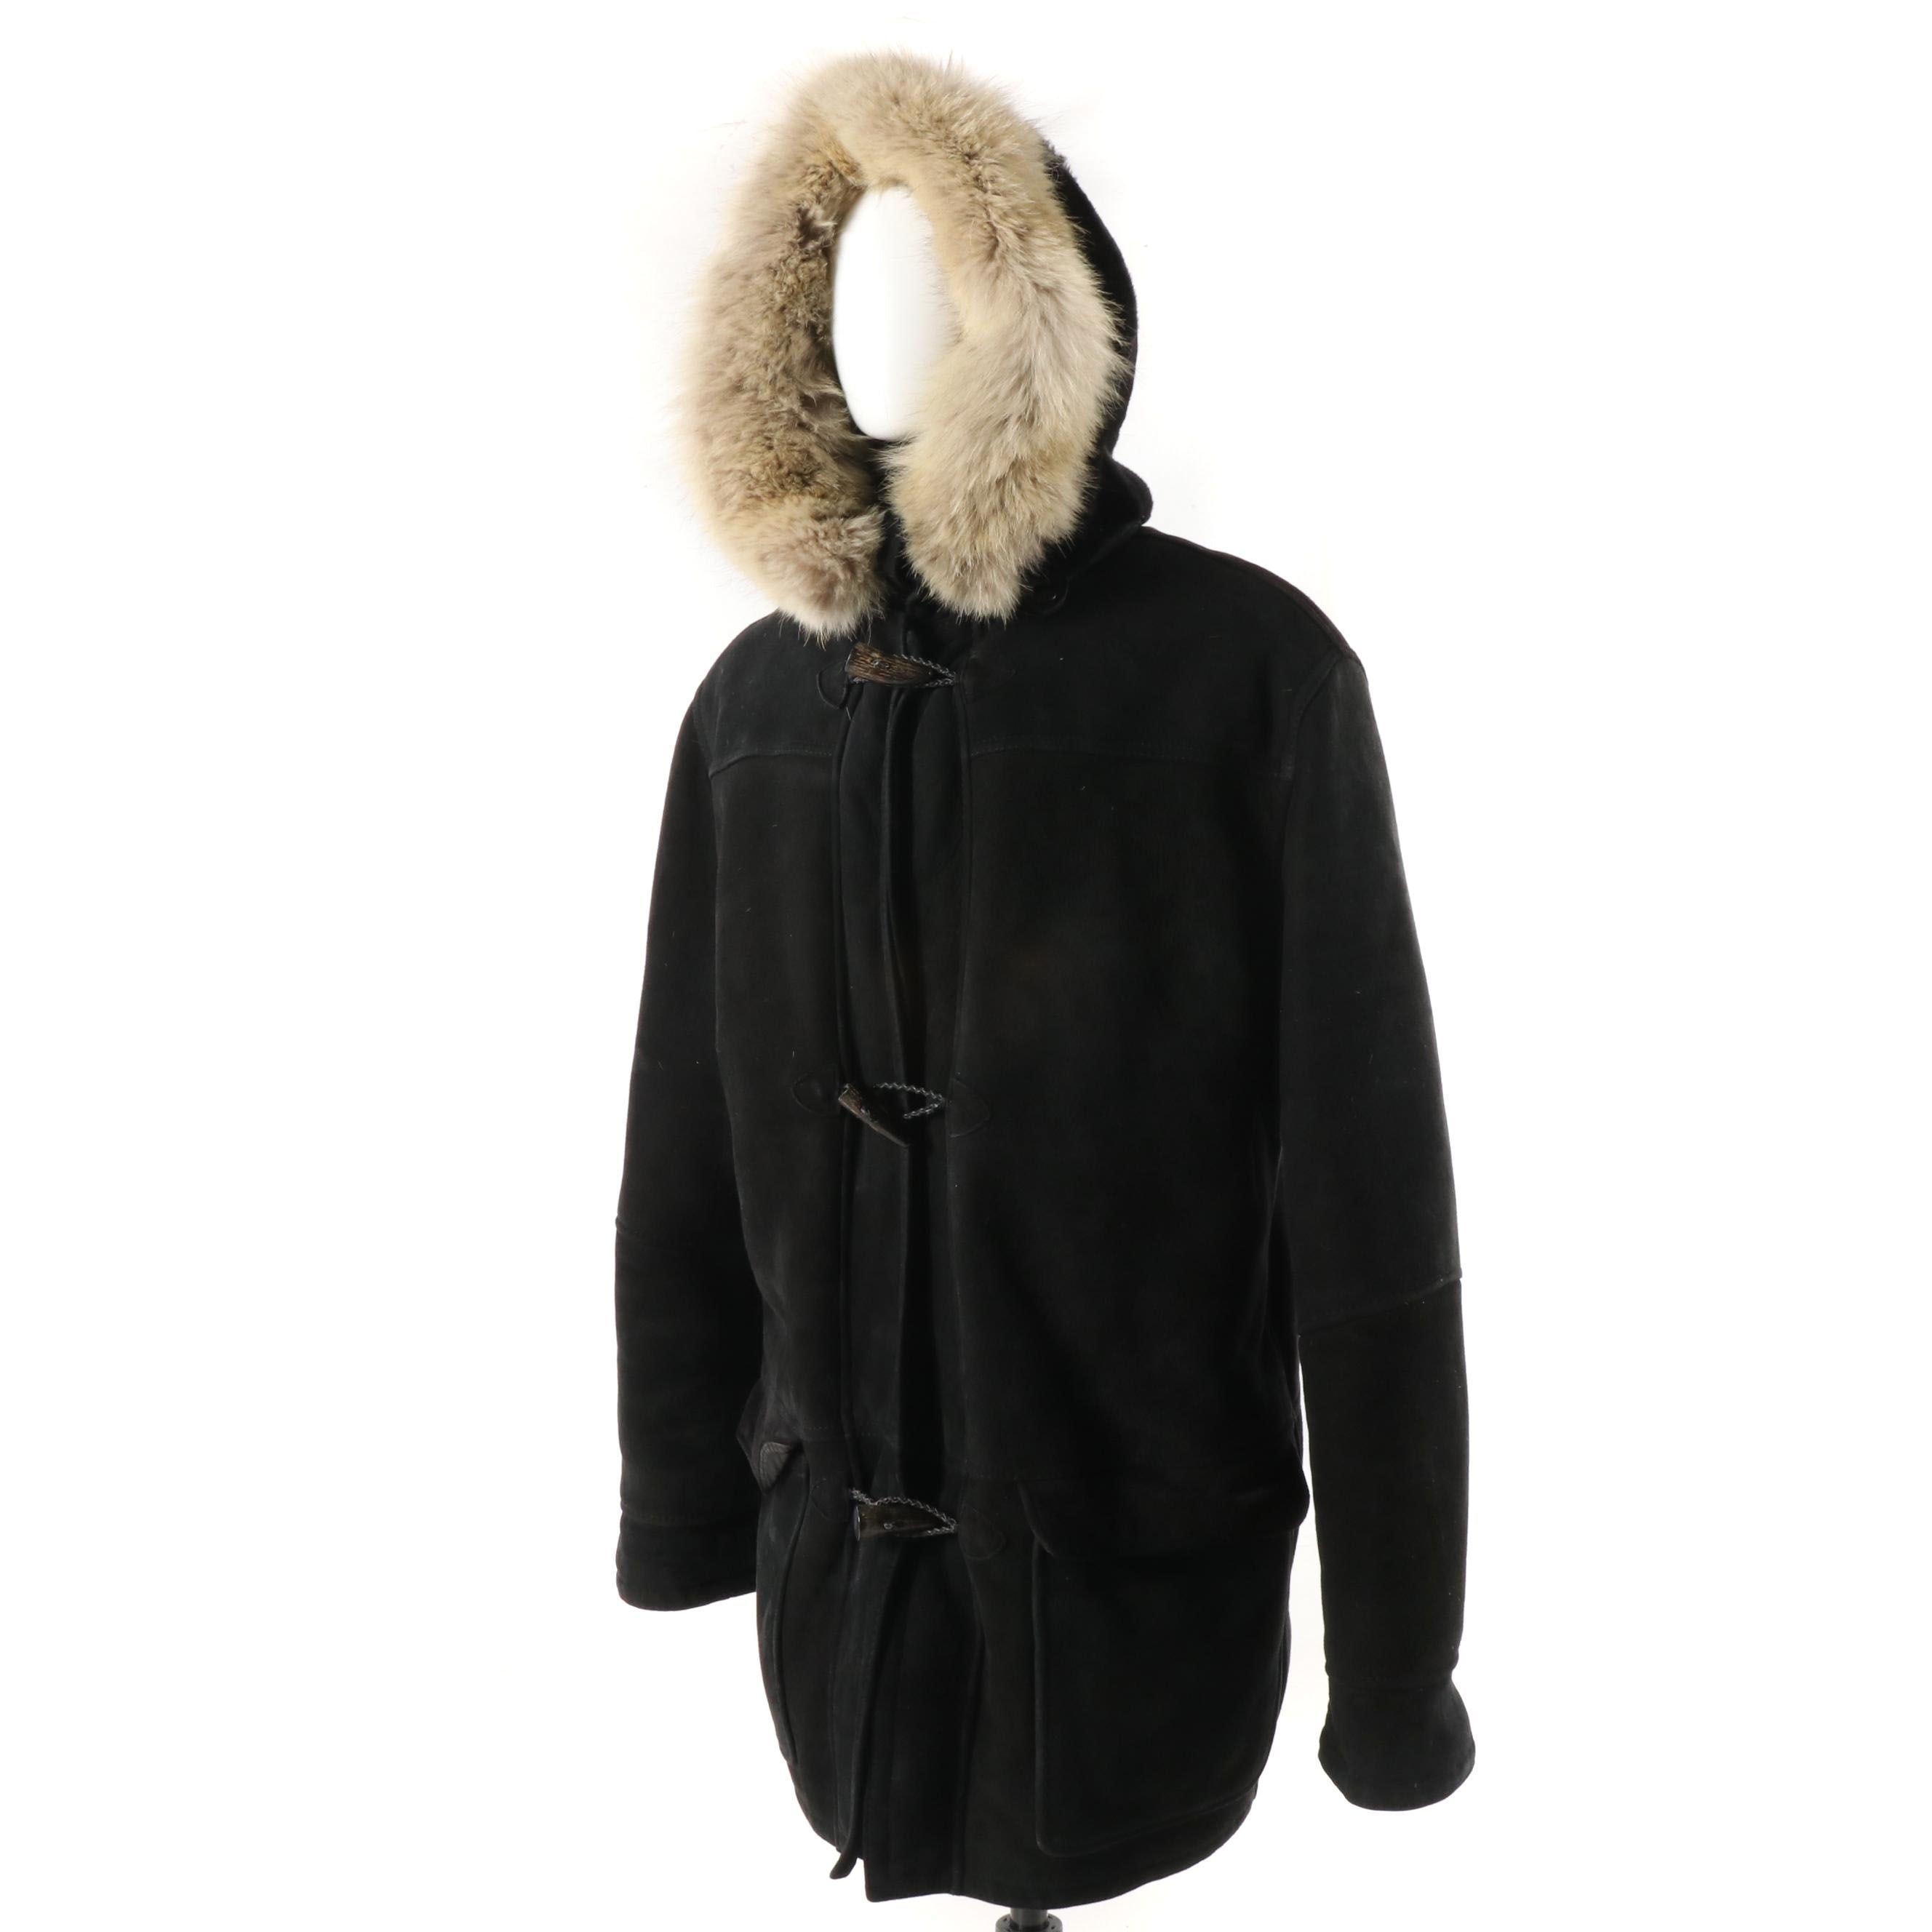 Men's Ardney Black Sheepskin Duffle Coat with Fur Trim Hood and Horn Toggles